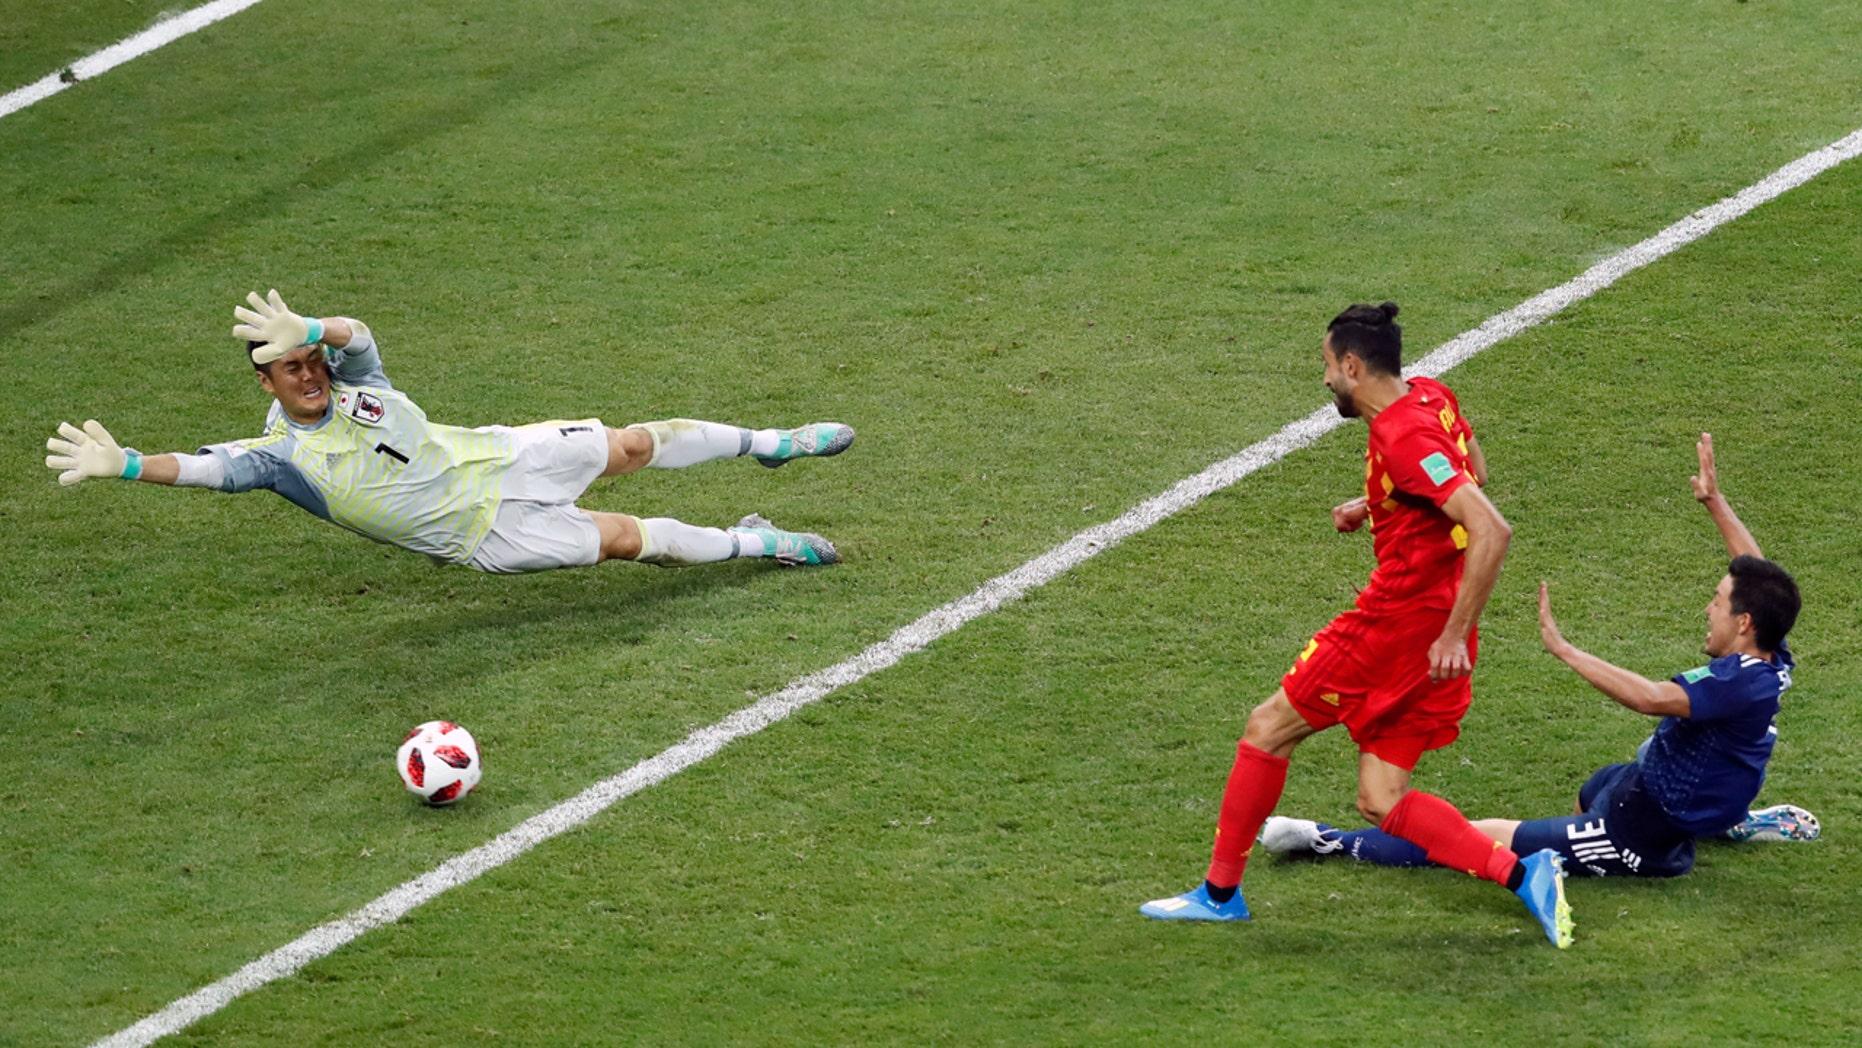 Belgium's Nacer Chadli scores the winning goal past Japanese keeper Eiji Kawashima in the World Cup last 16 match.